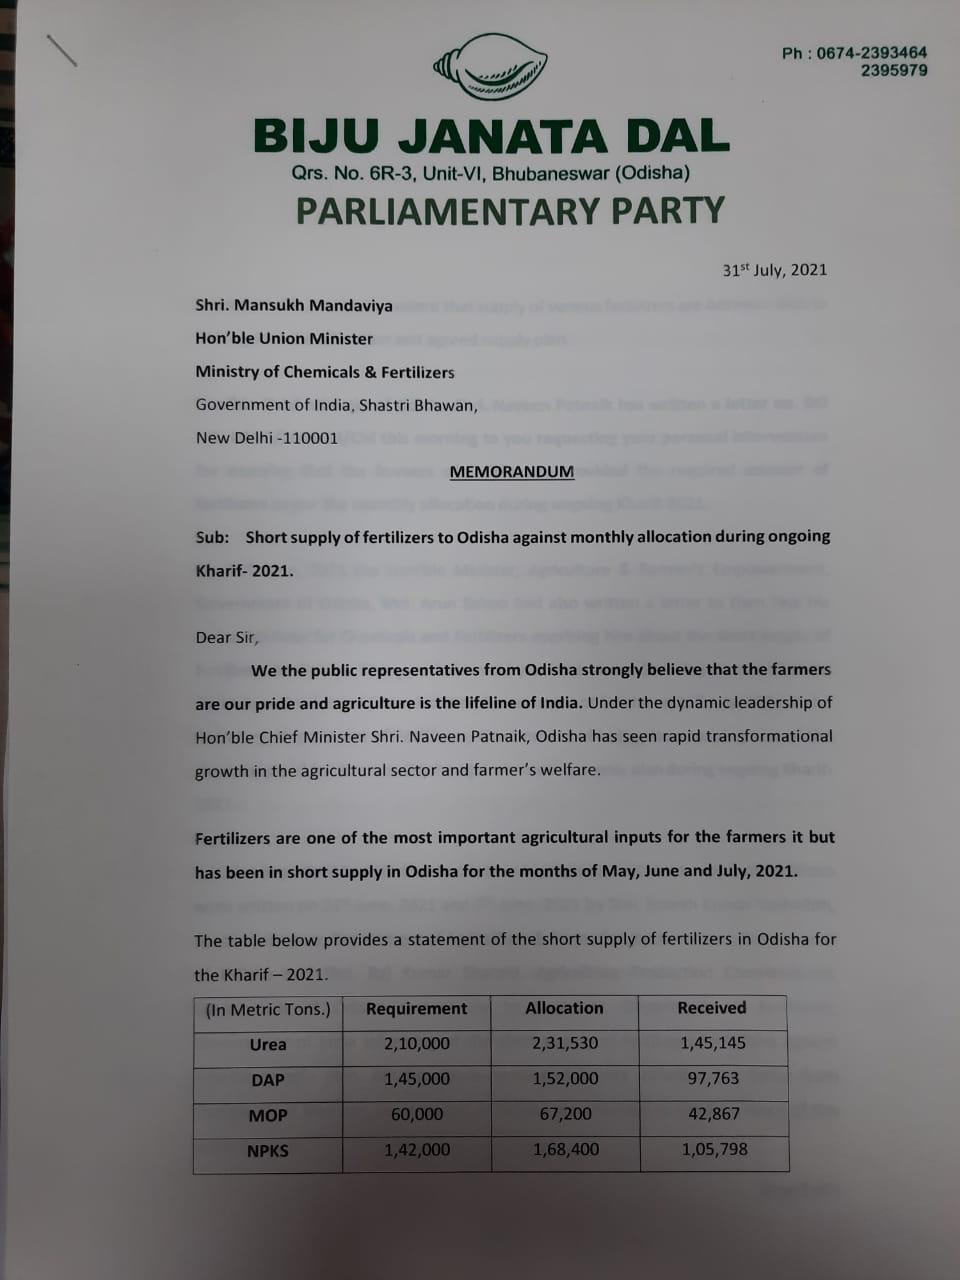 Odisha MPs submit memorandum to Union Minister Mansukh Mandaviya